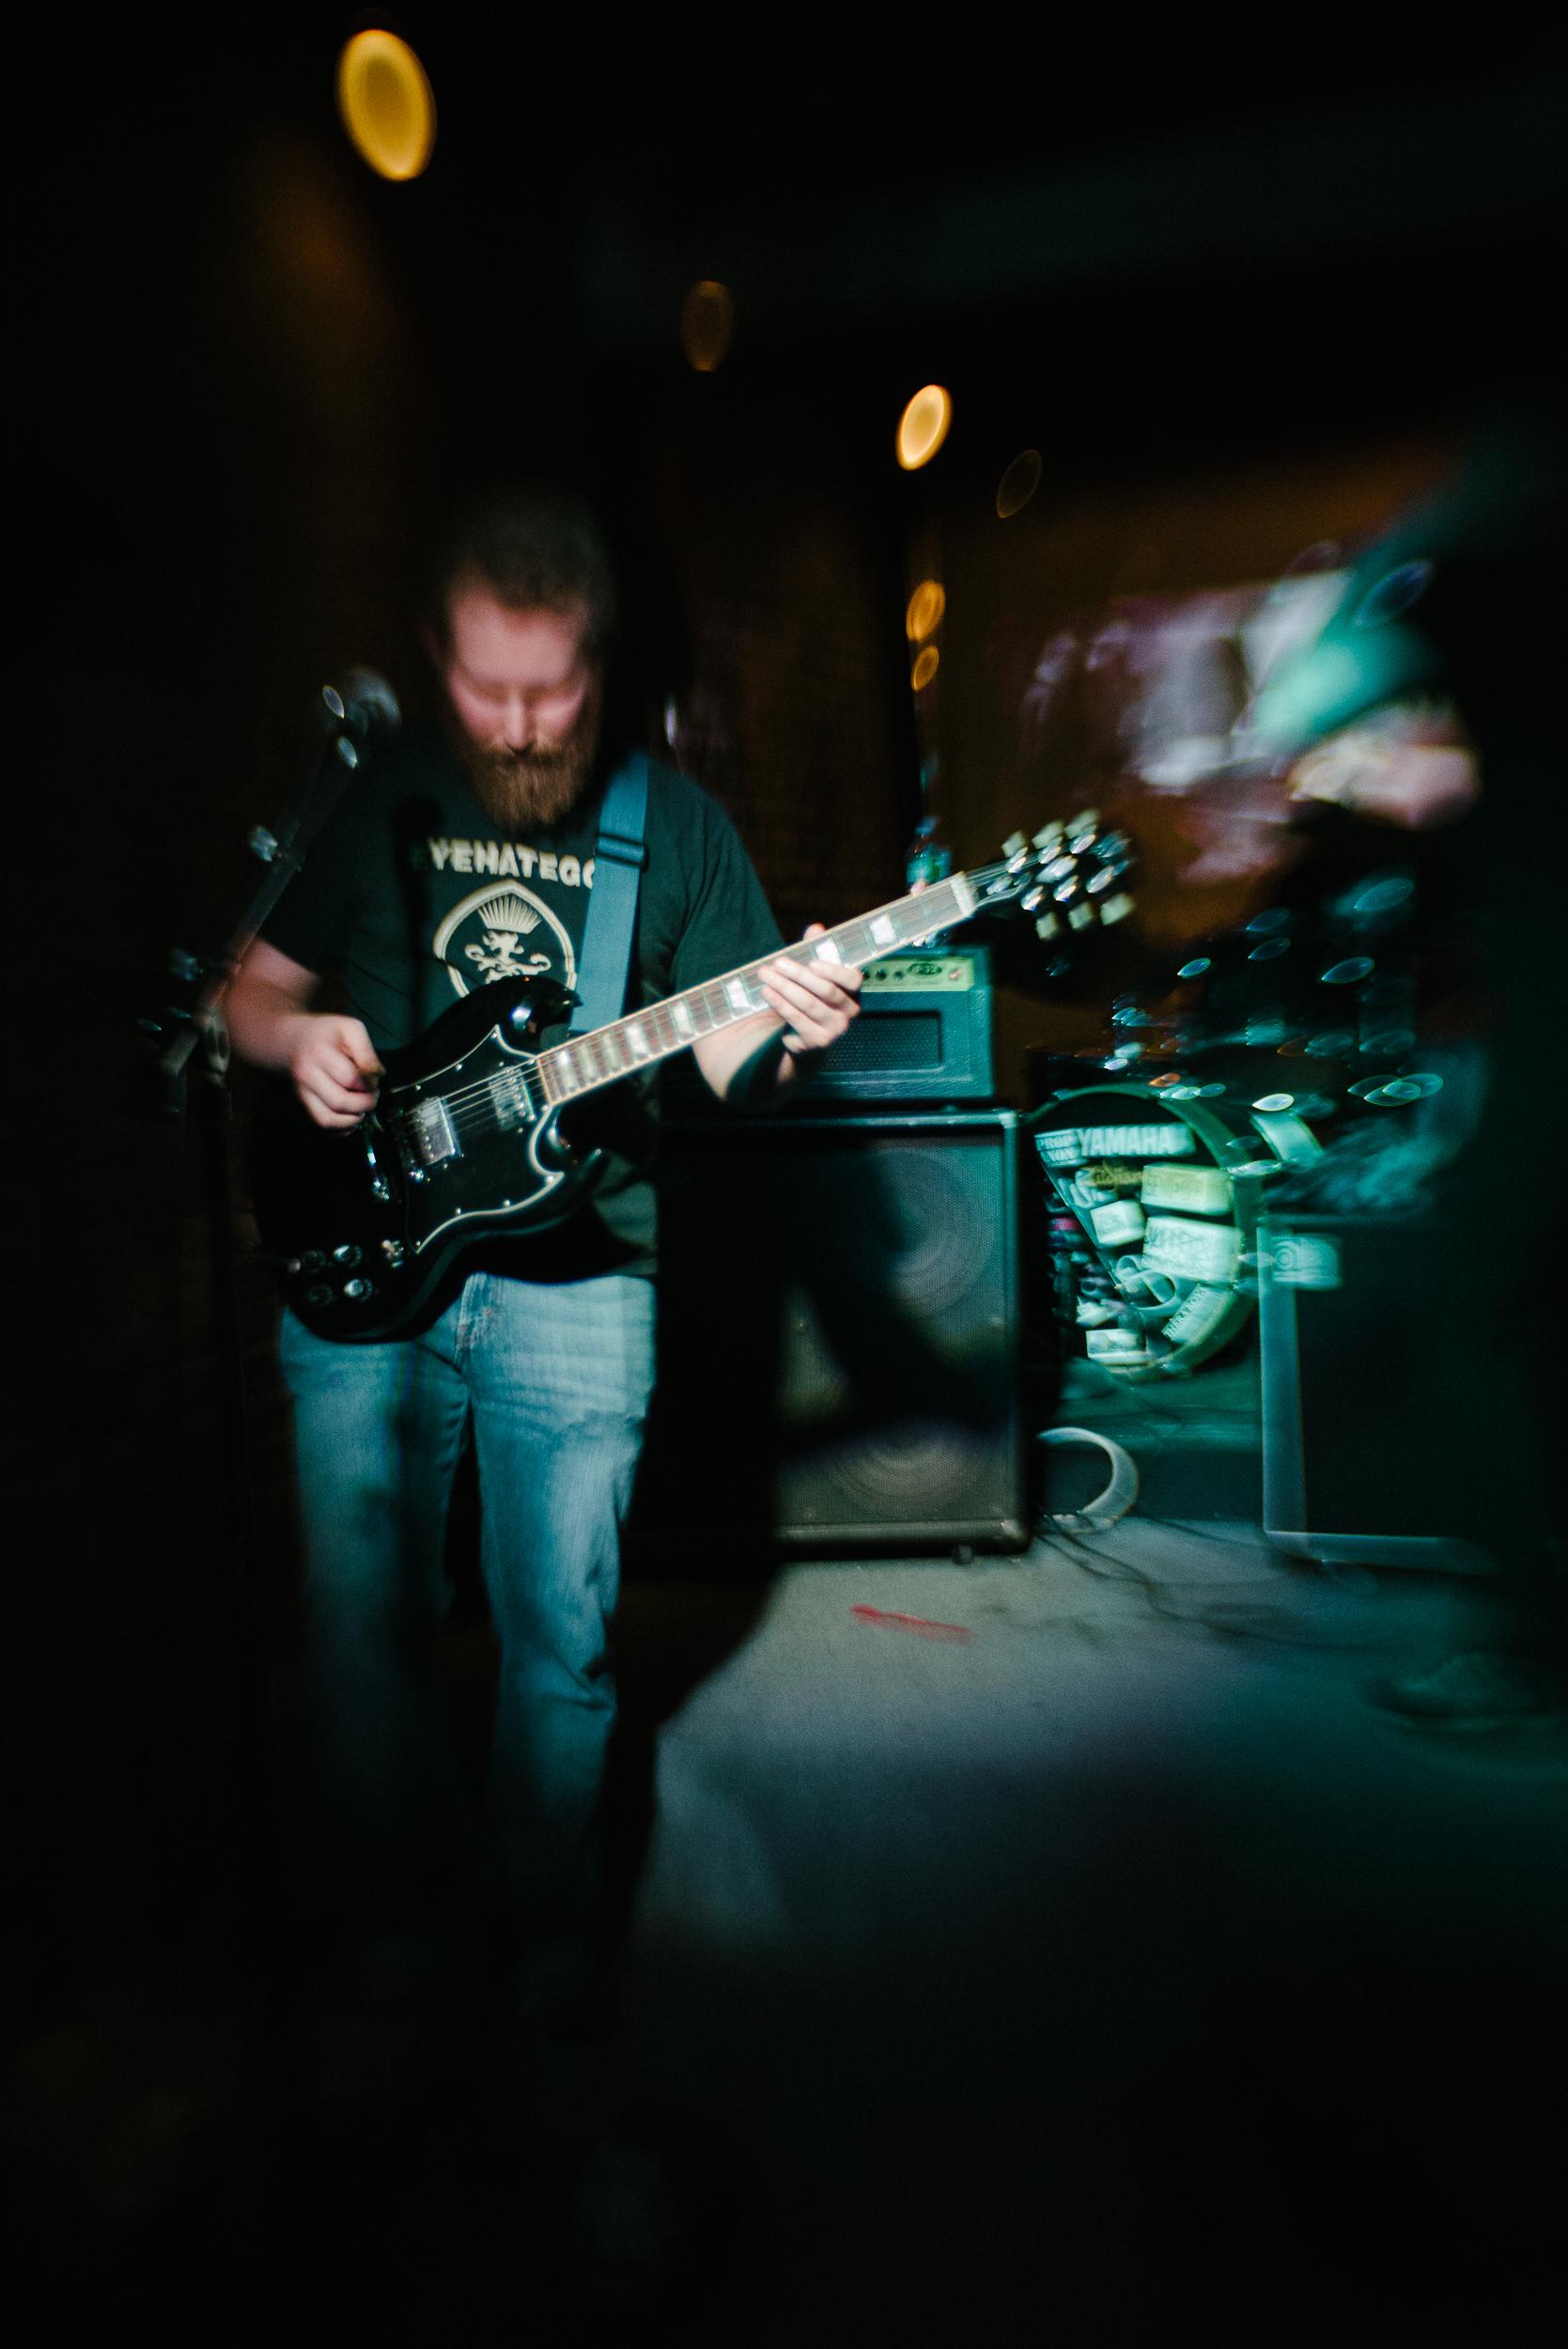 hail-eris-lensbaby-guitar-band-editorial-photography-nyc-leftfield.jpg